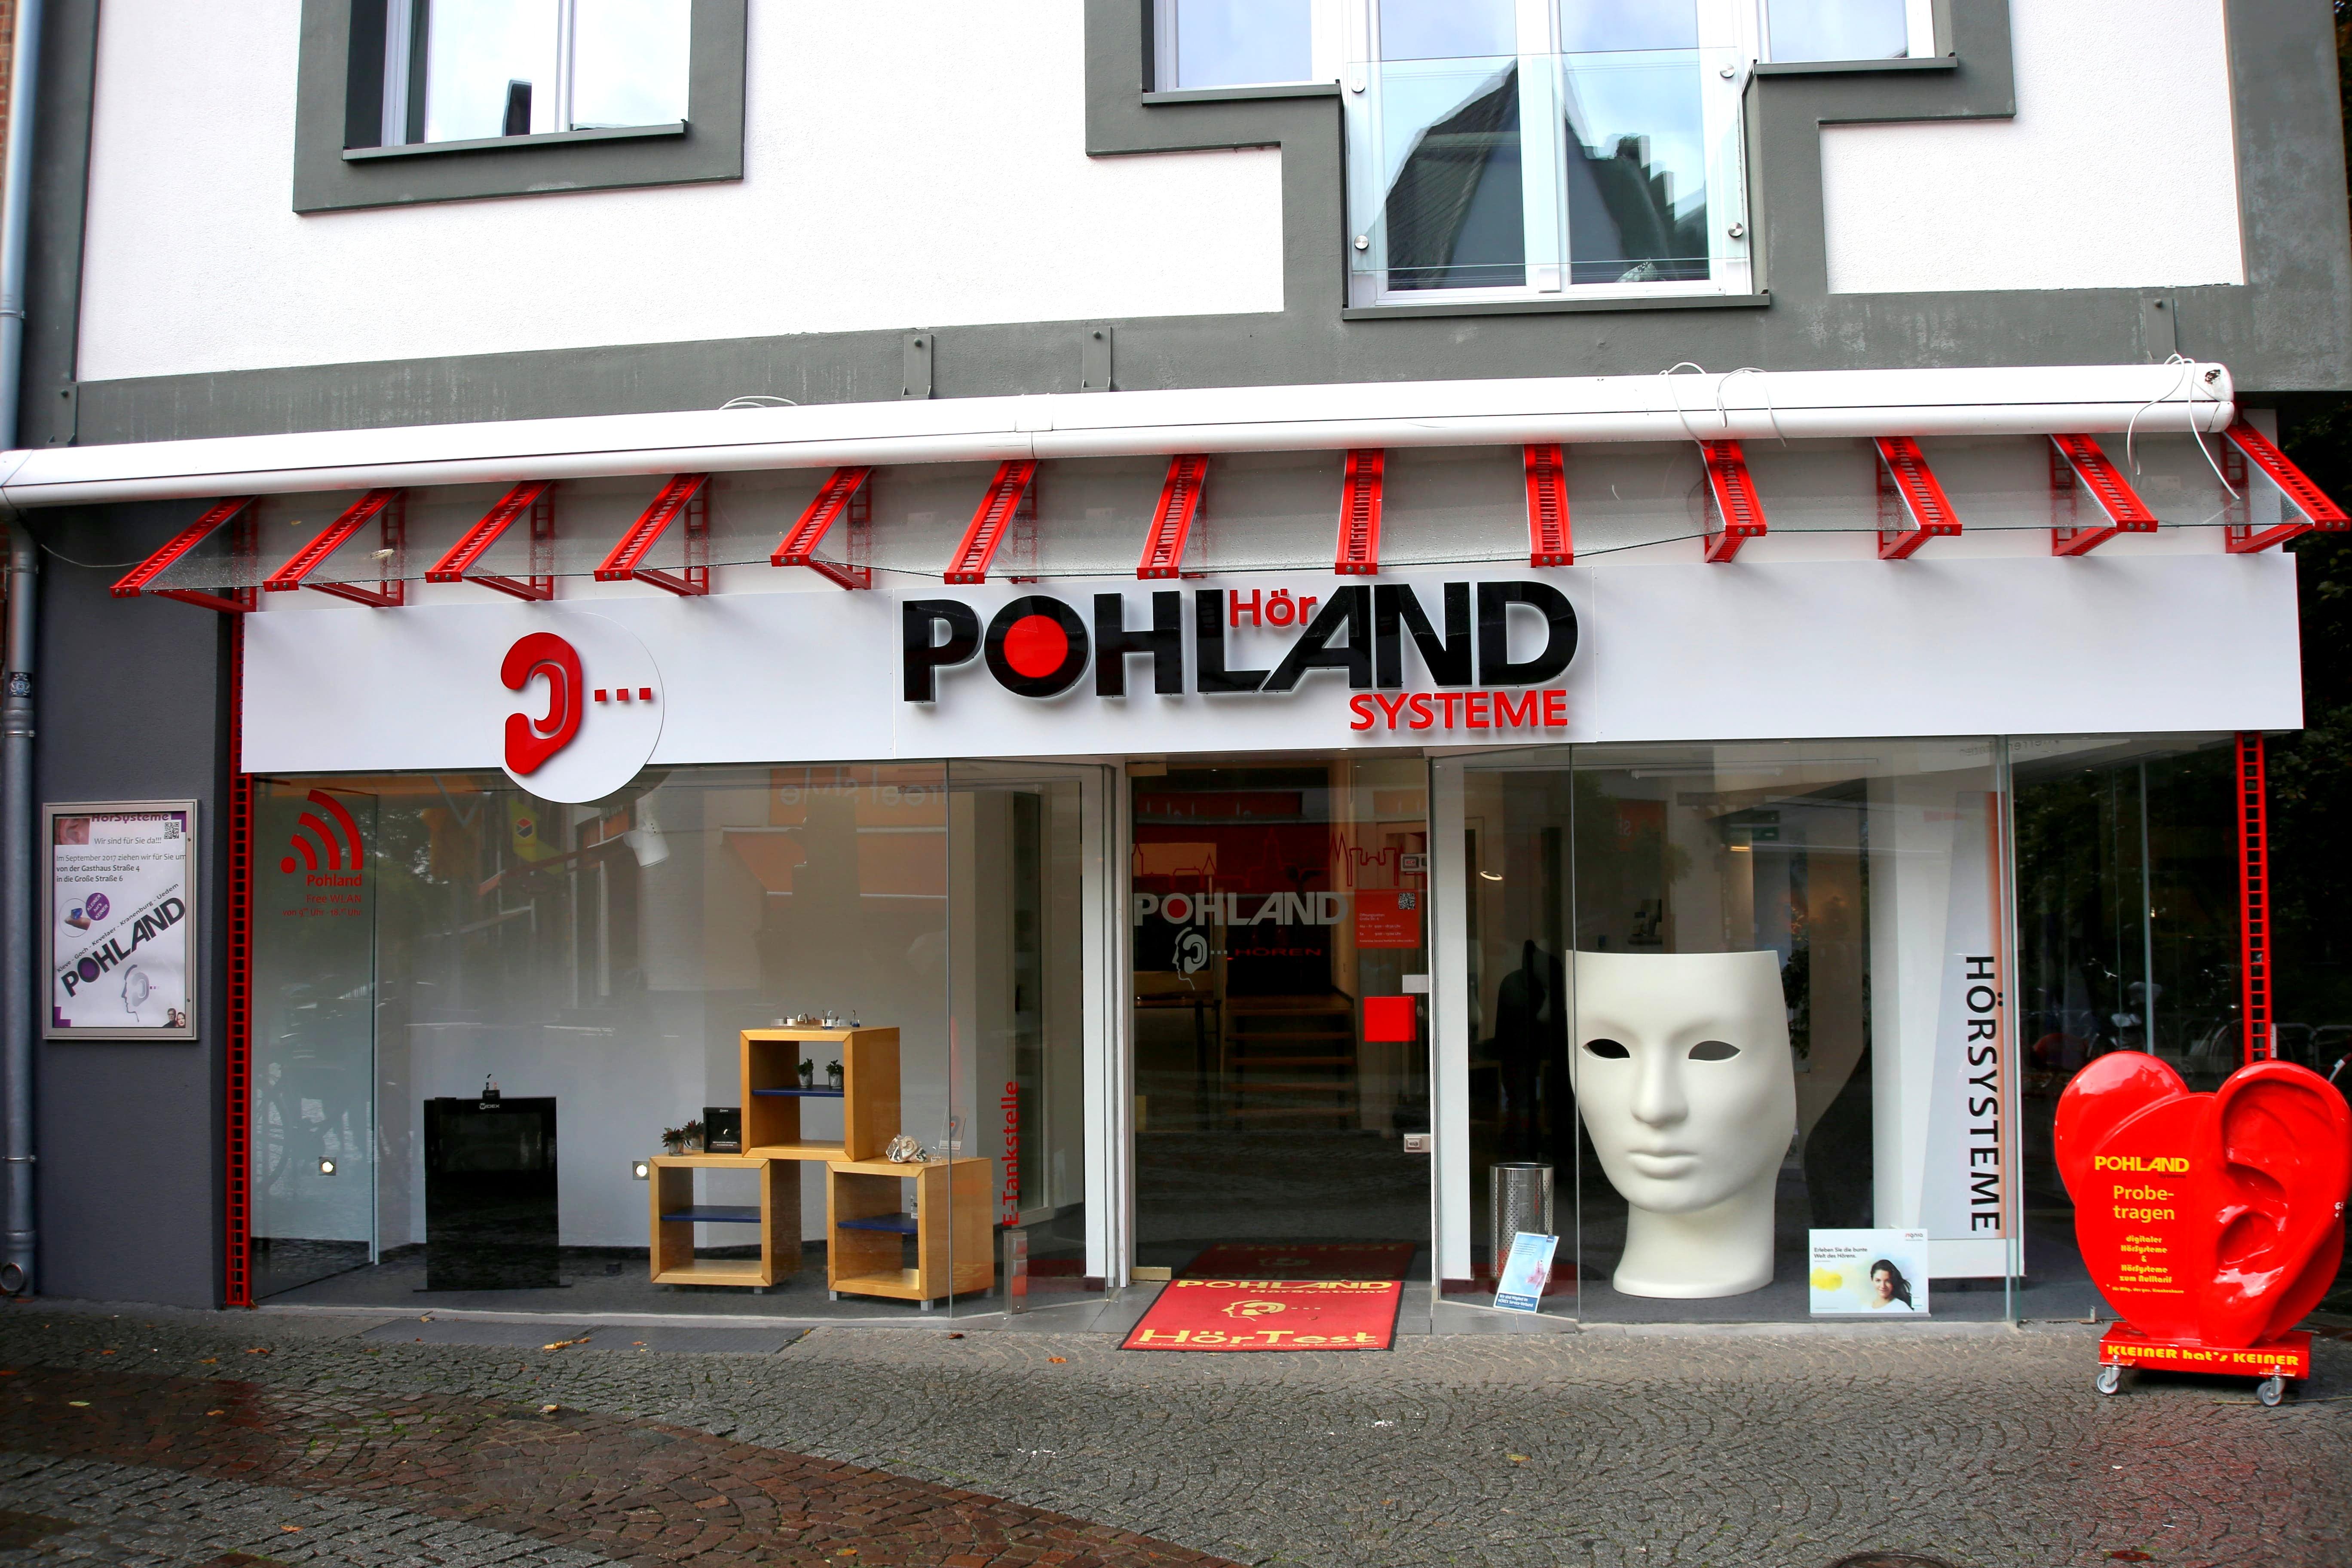 Aussenfassade Pohland Hörakustik KU